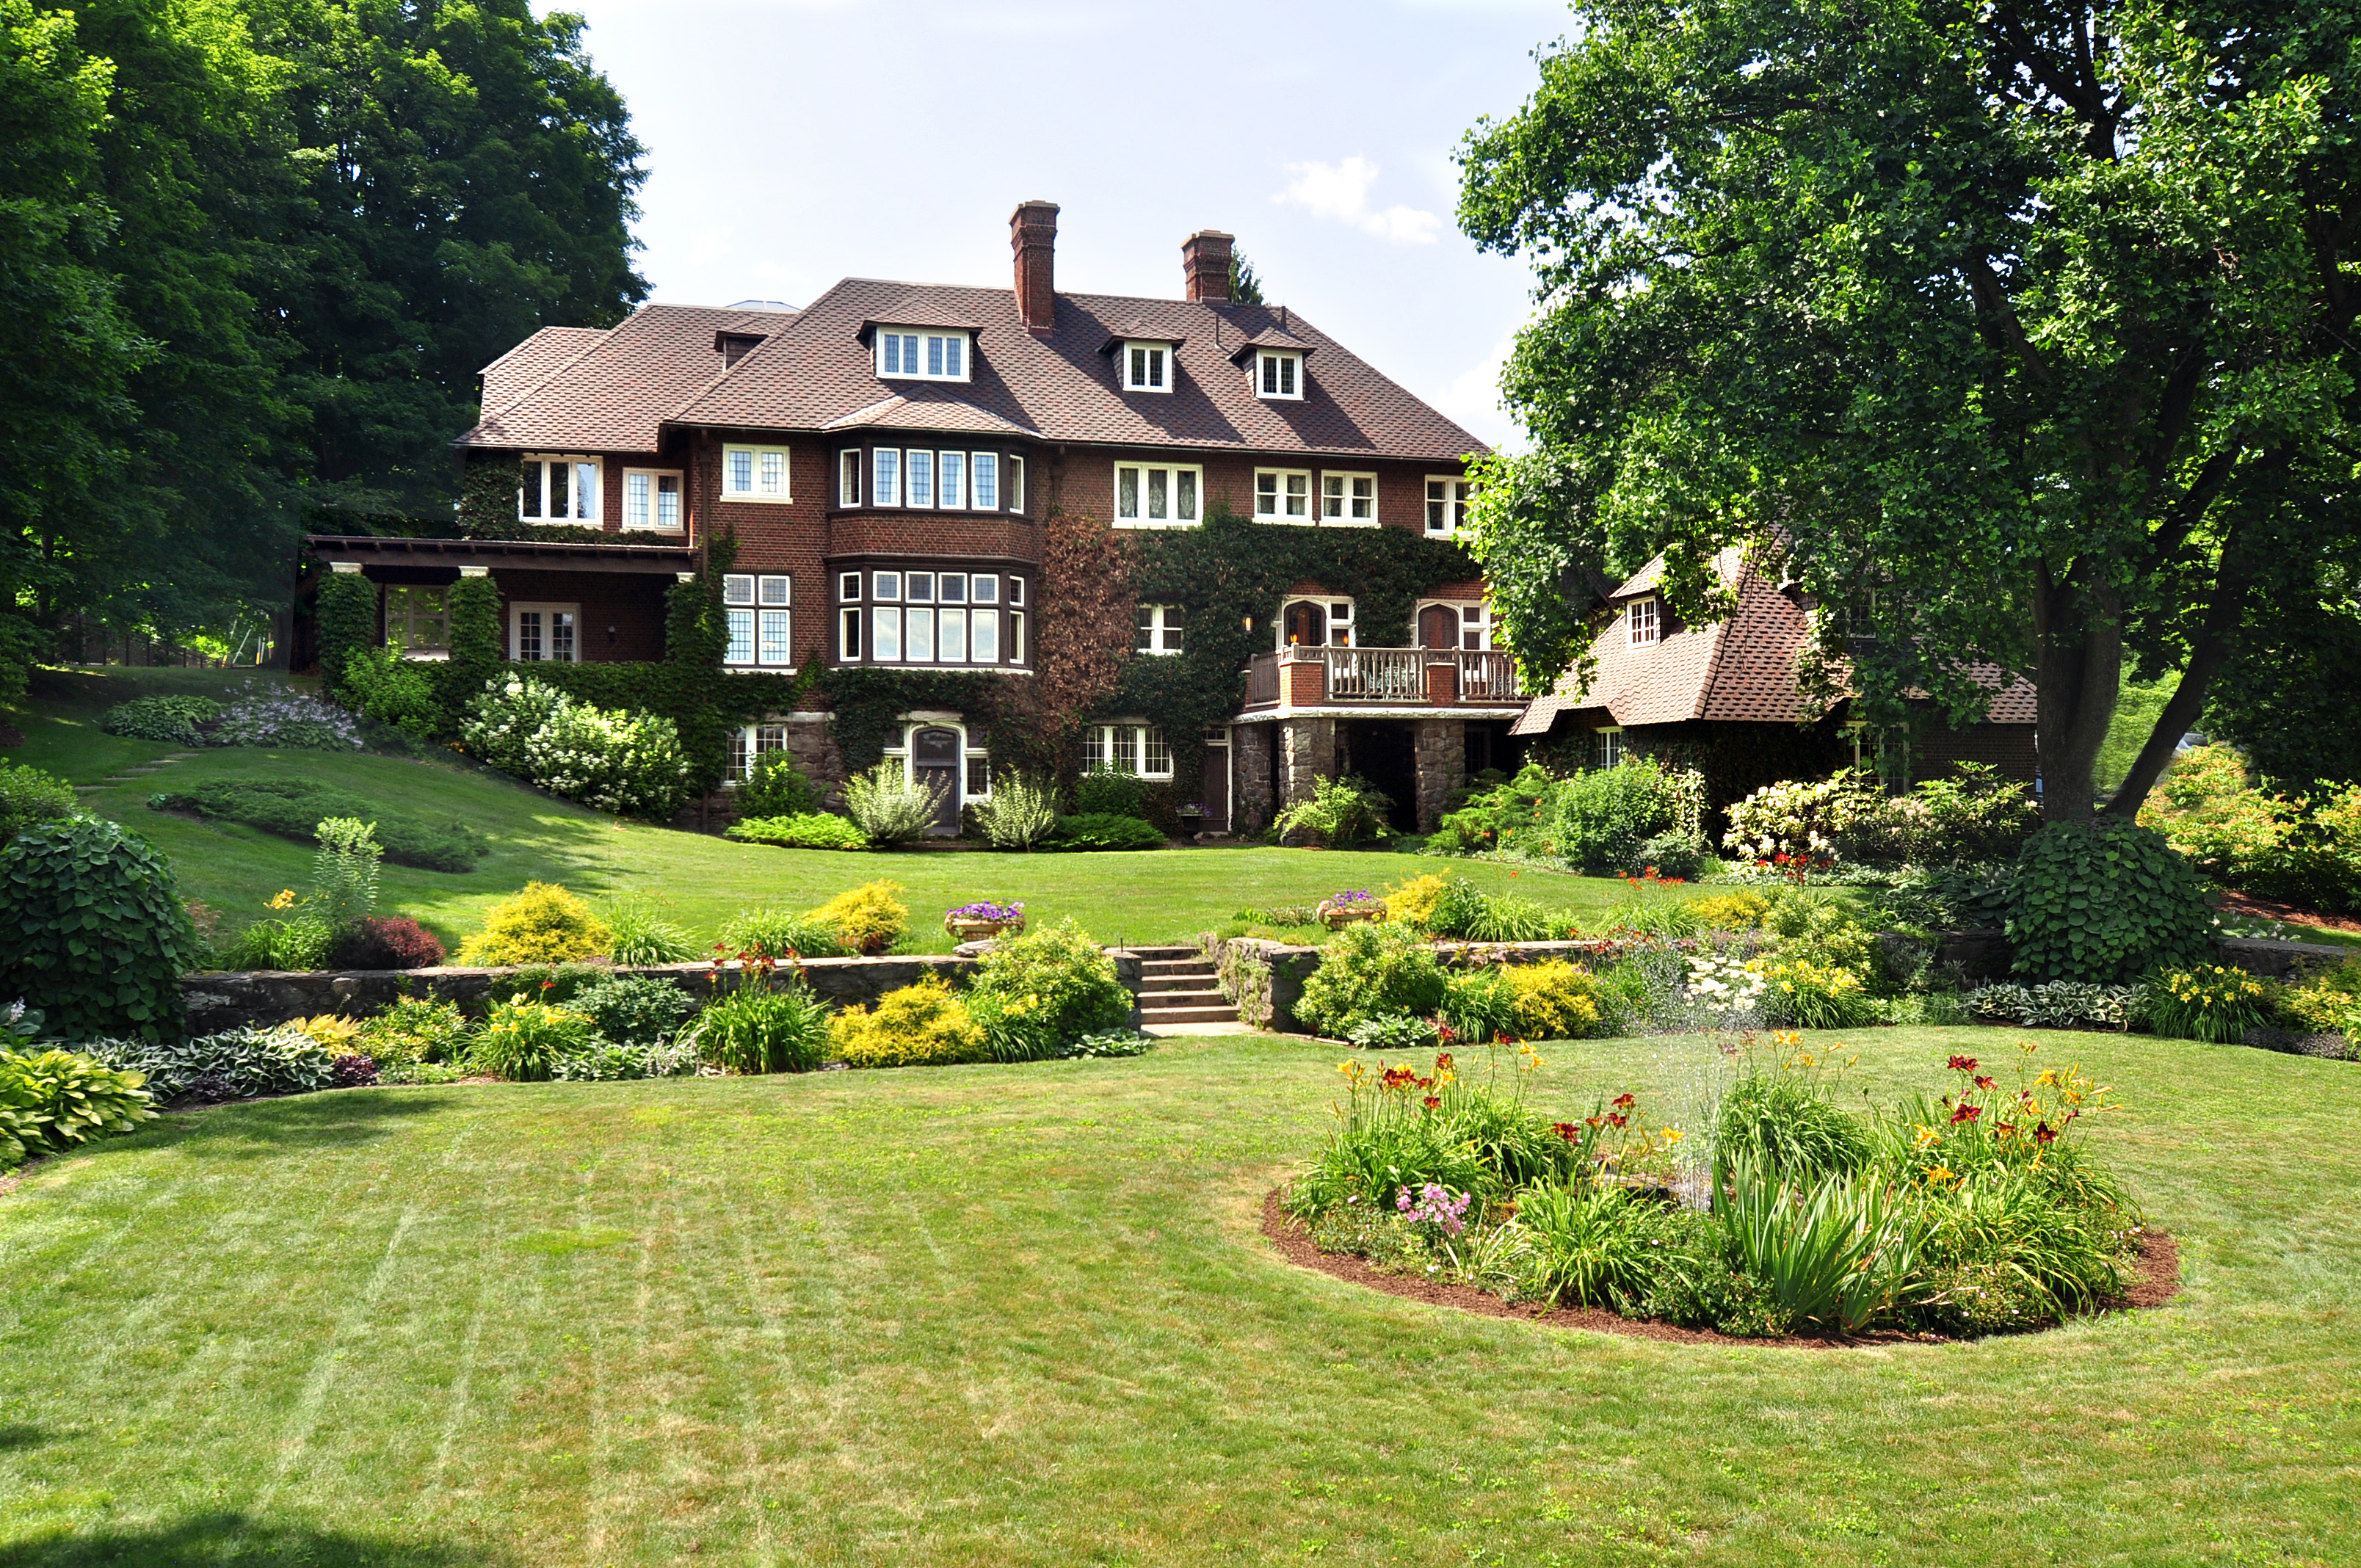 独户住宅 为 销售 在 11-Acre Estate, Tudor Masterpiece, Golf Course Living 575 South Street Pittsfield, 马萨诸塞州 01201 美国